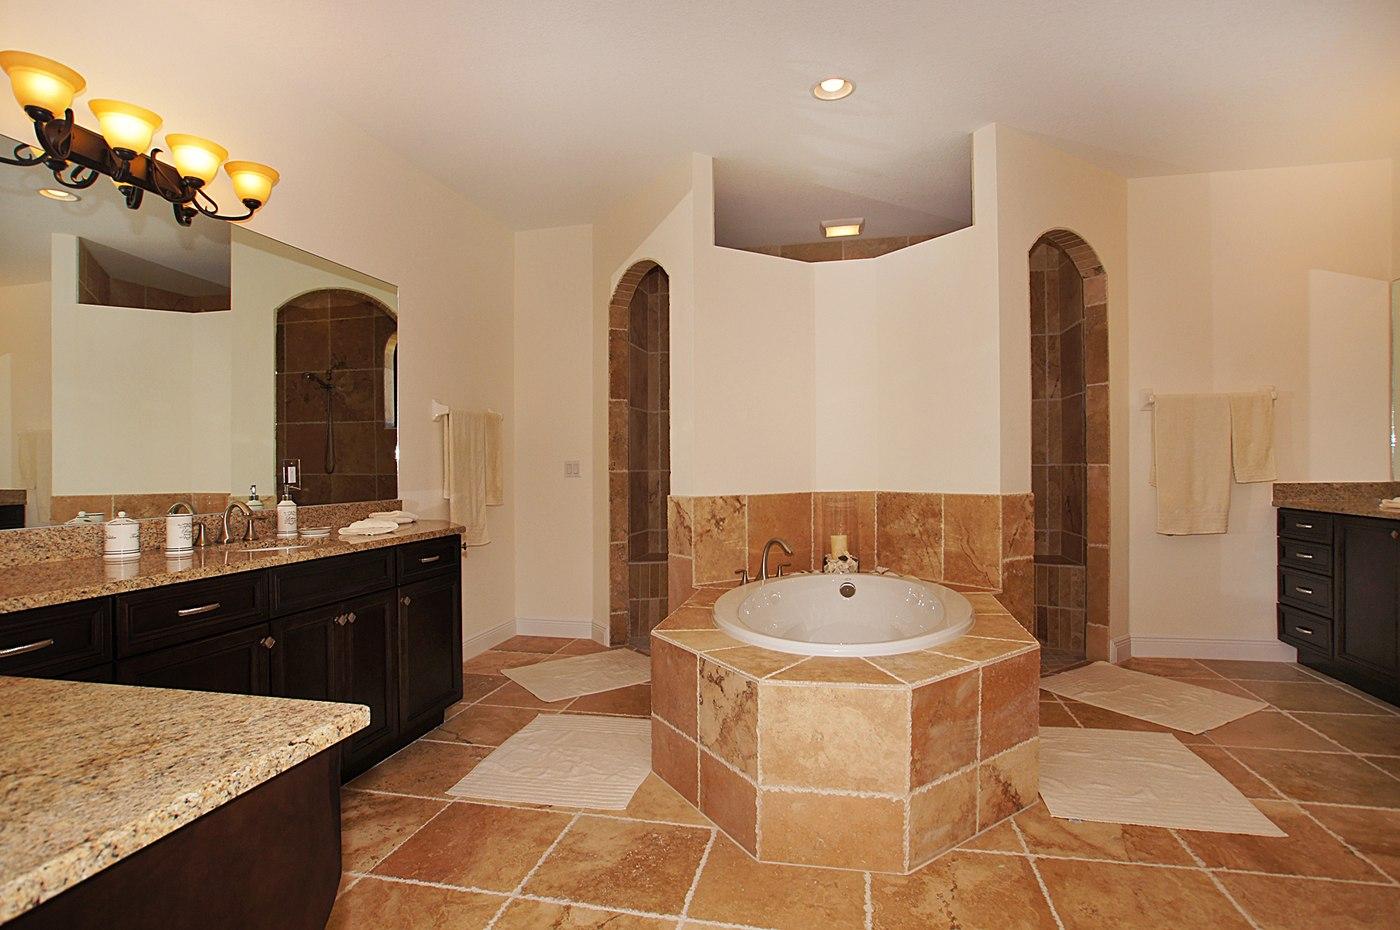 Bathroom in Florida